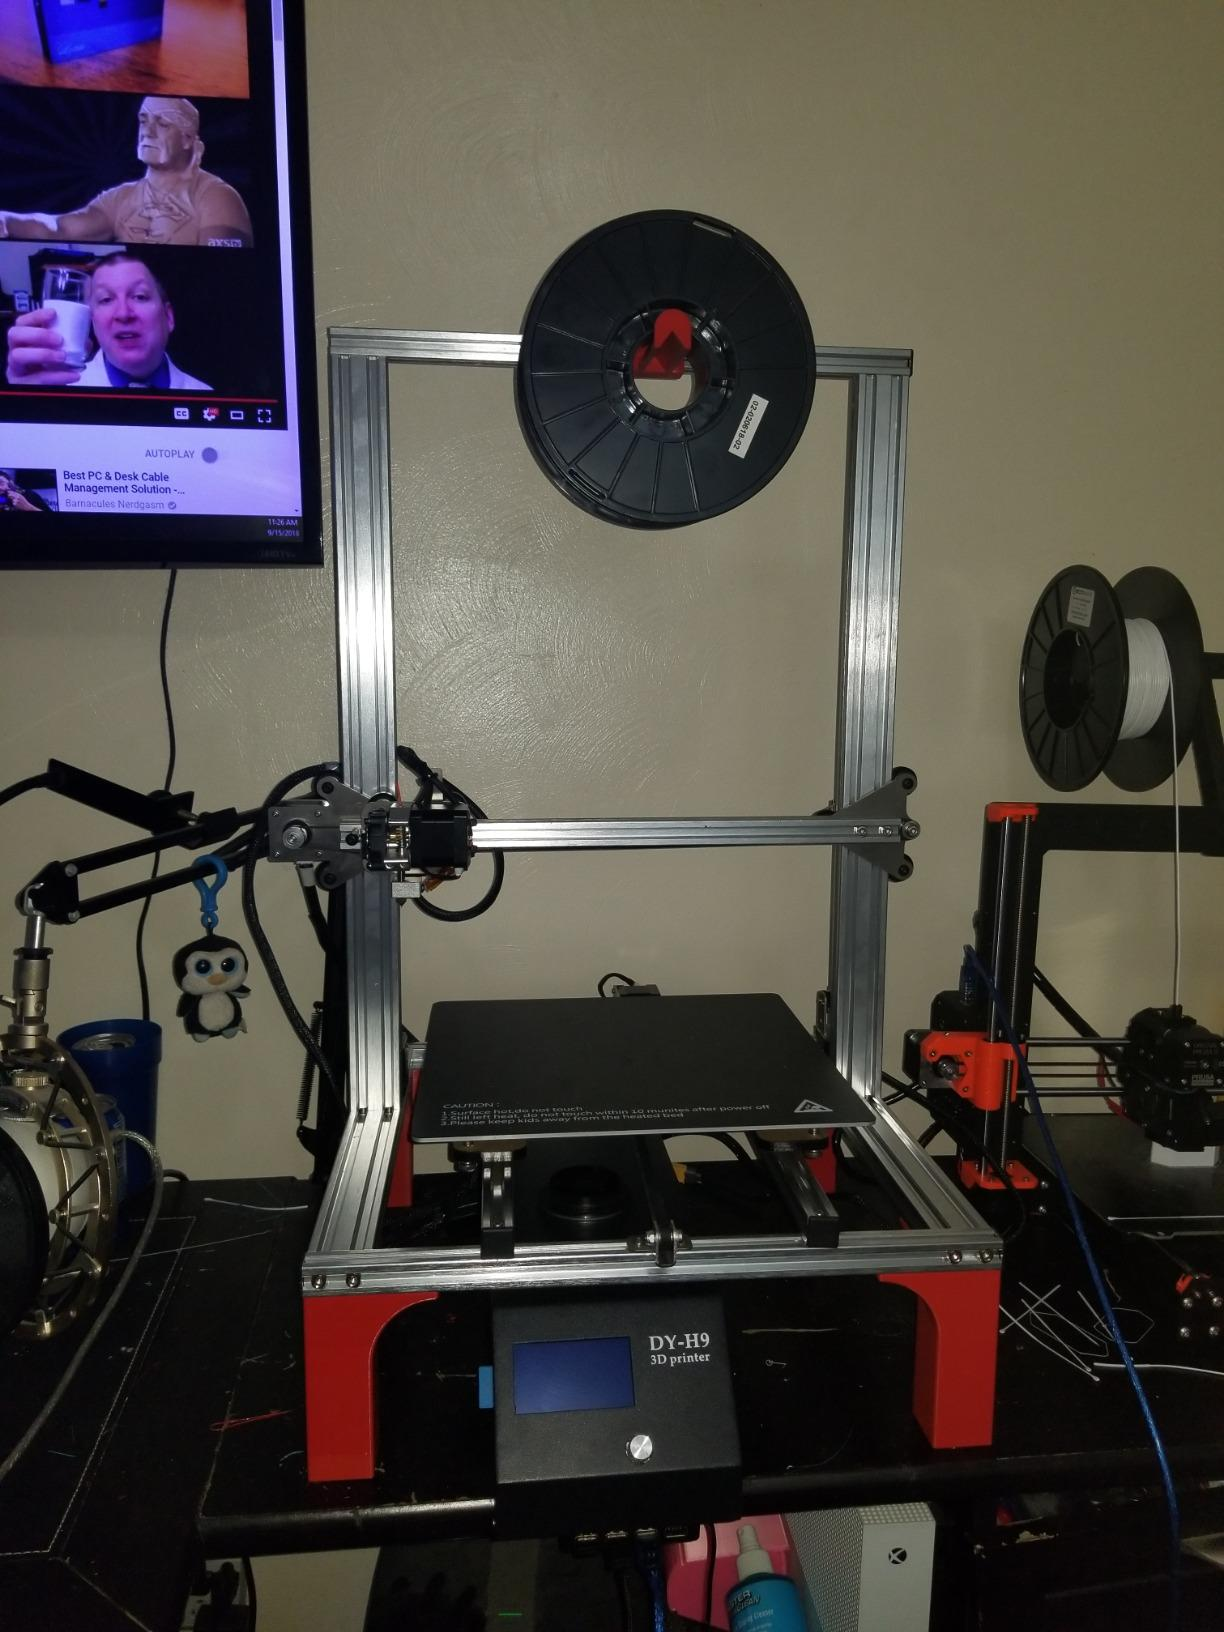 3D Printer, Aluminum Prusa i3 DIY Pre-Assembly 3D Printer Kit with